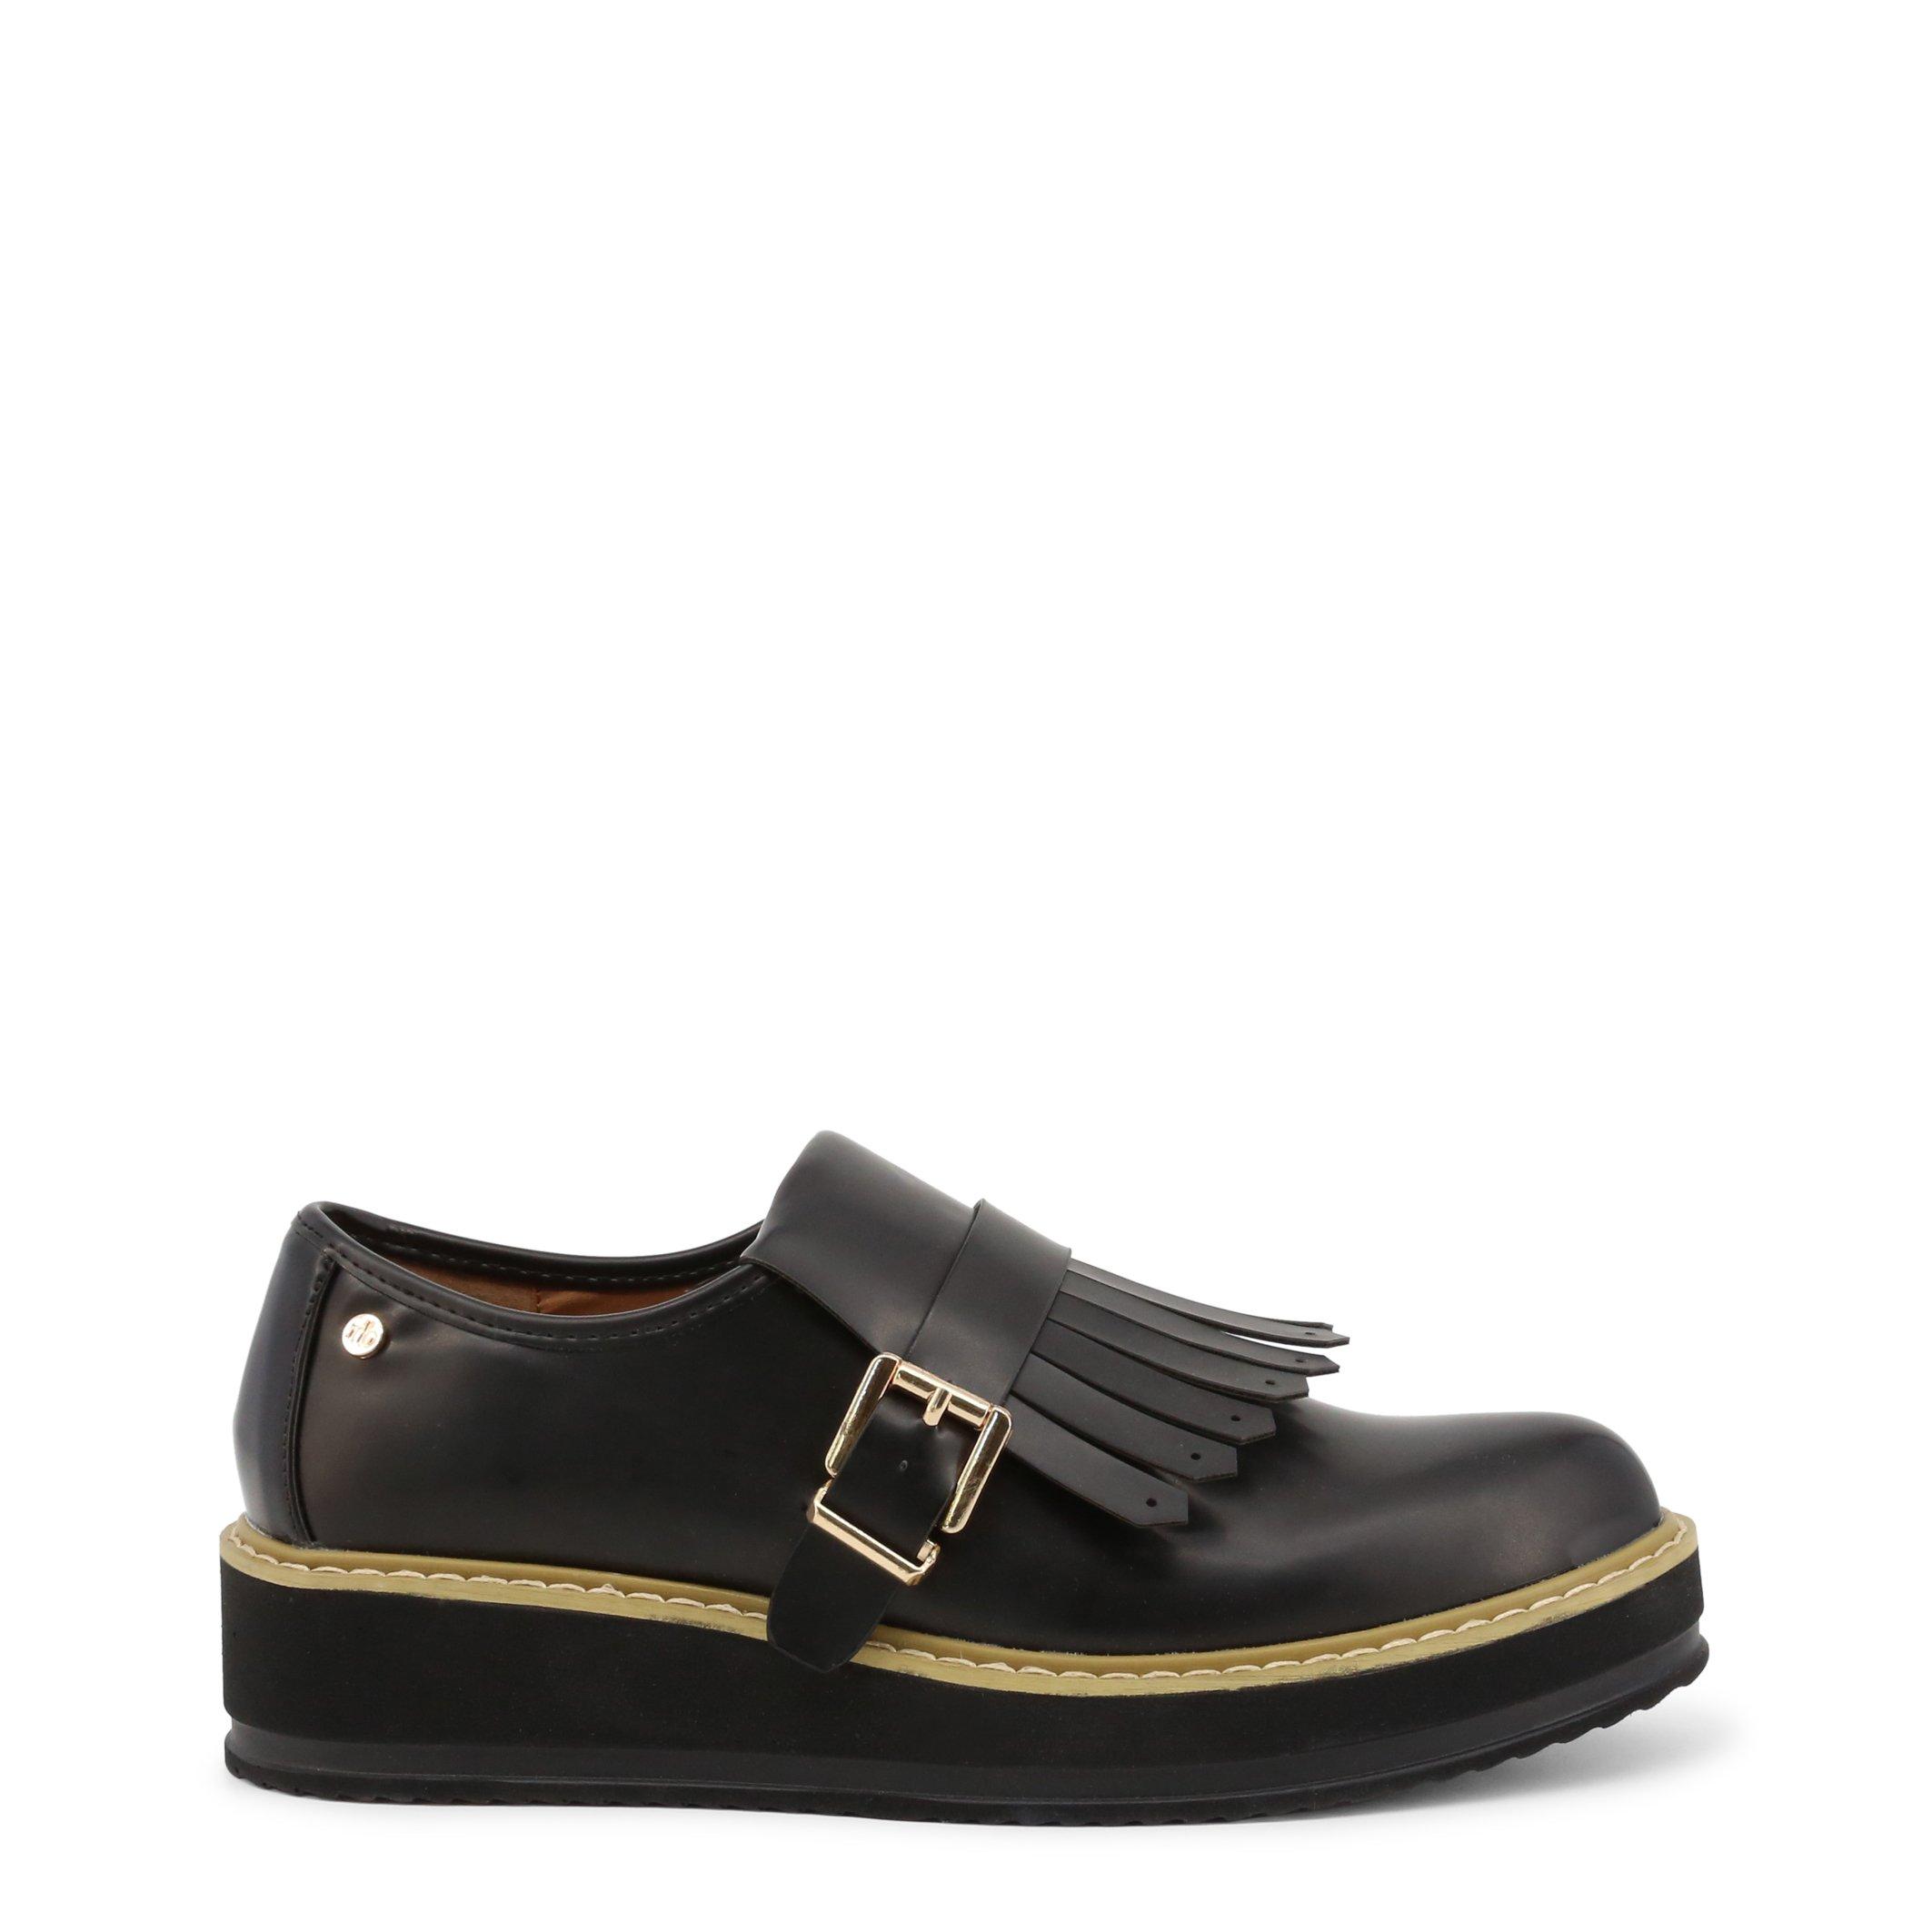 Roccobarocco Women's Flat Shoe Red RBSC1JM01 - black EU 35